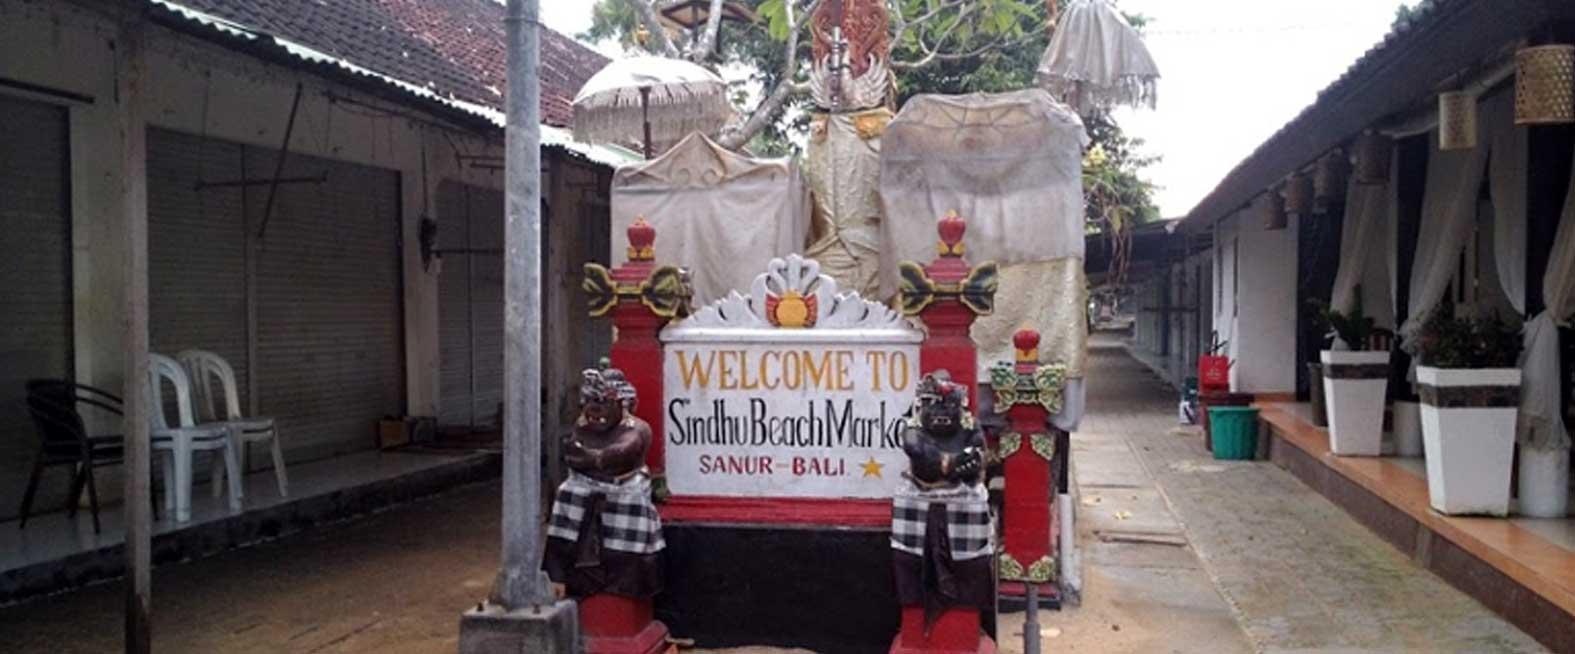 Sindhu Beach Art Market